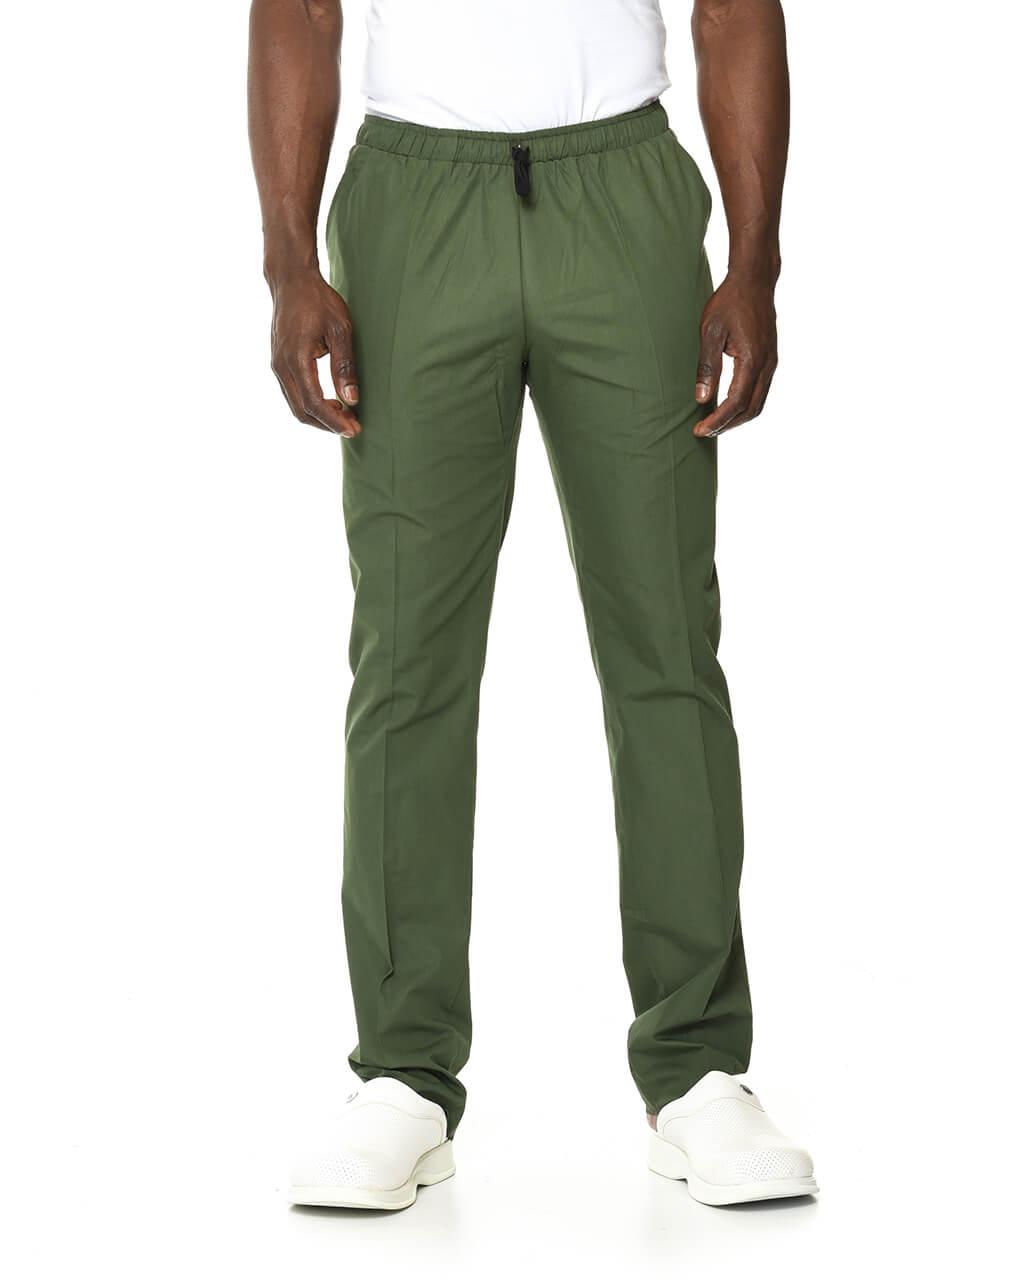 Terrycotton Asker Yeşili Pantolon